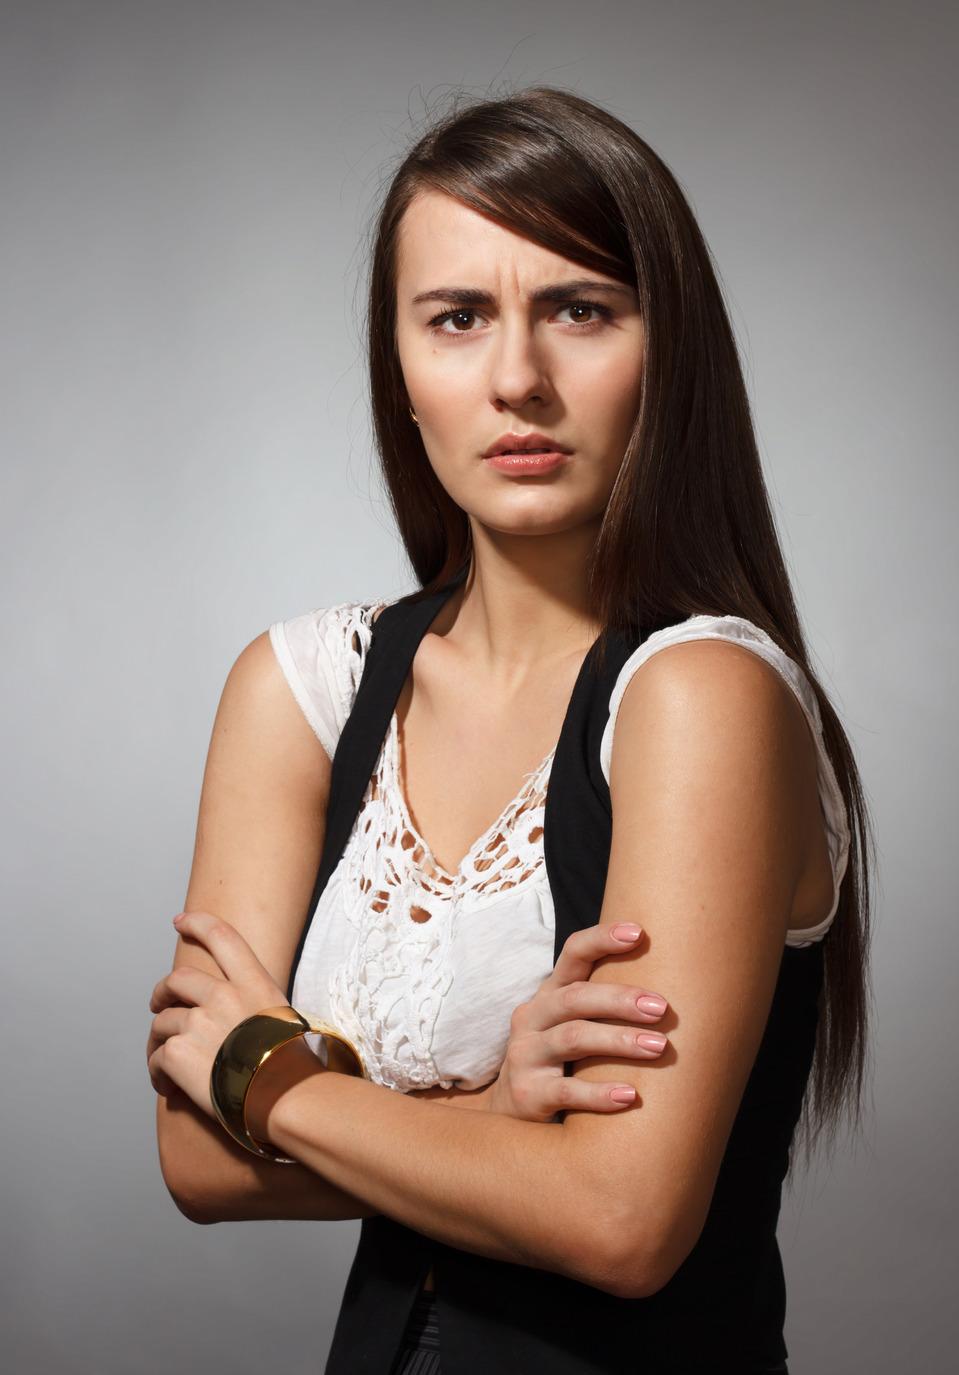 Indignation of a woman | portrait, model, woman, long hair, brunette, indignation, emotions, face